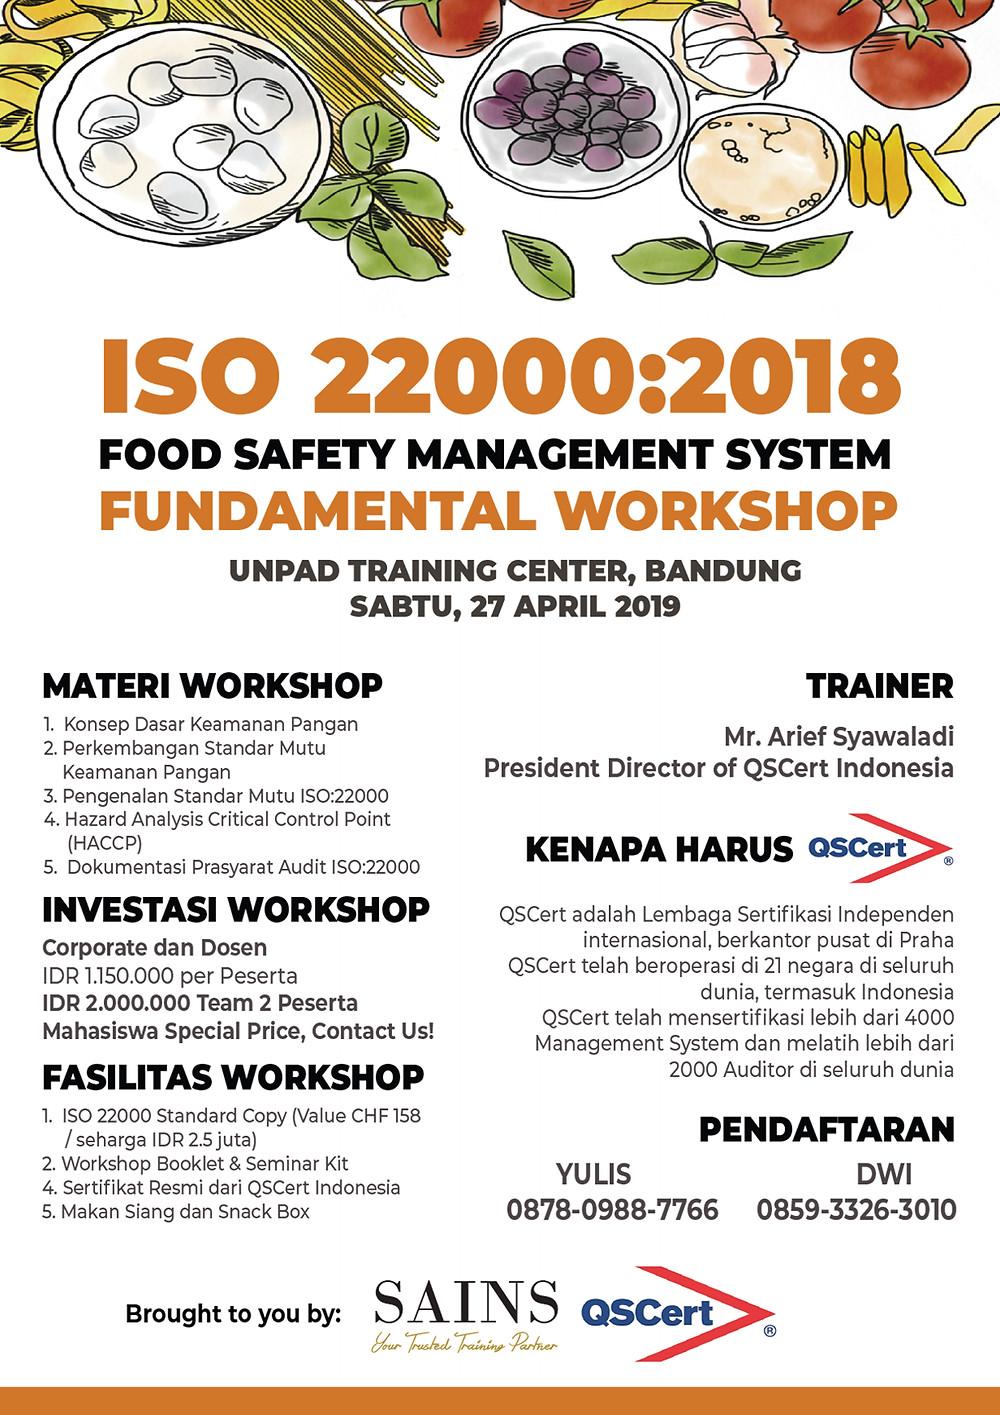 27 April 2019, Universitas Padajajaran Bandung, IDR 1.150.000, Info : 0878 0988 7766 (yuli)